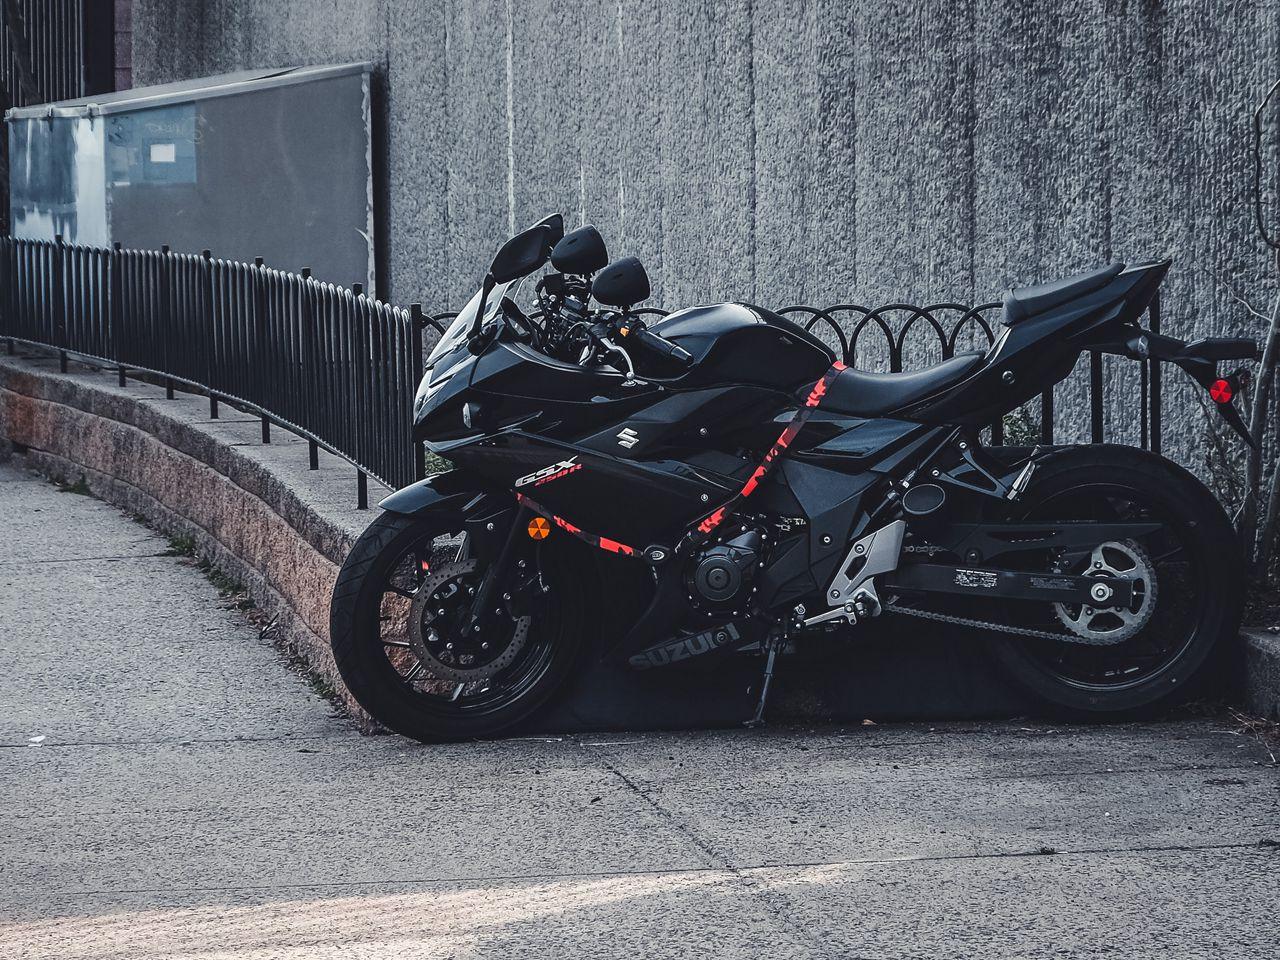 1280x960 Wallpaper suzuki, motorcycle, bike, black, parking